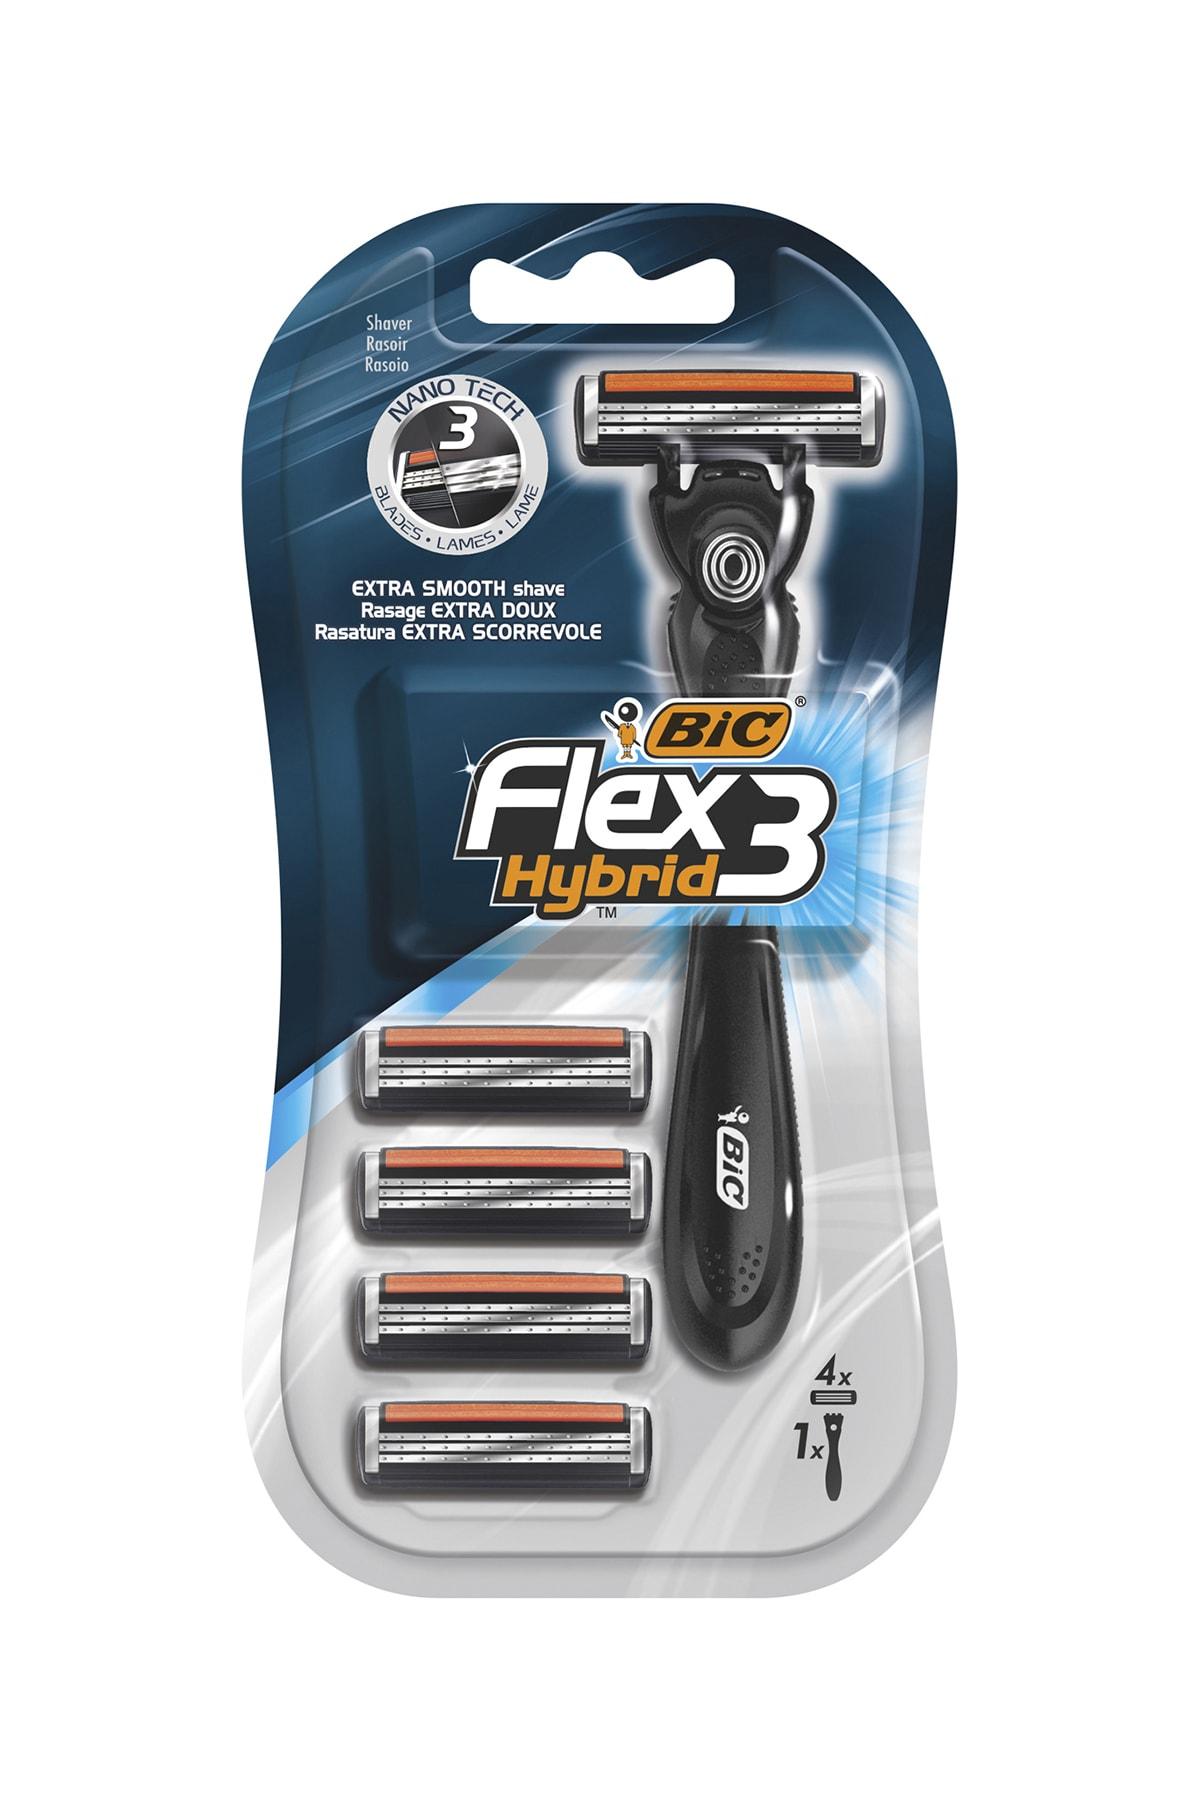 Bic Flex 3 Hybrid Tıraş Bıçağı 4 Kartuşlu (3 Bıçak)